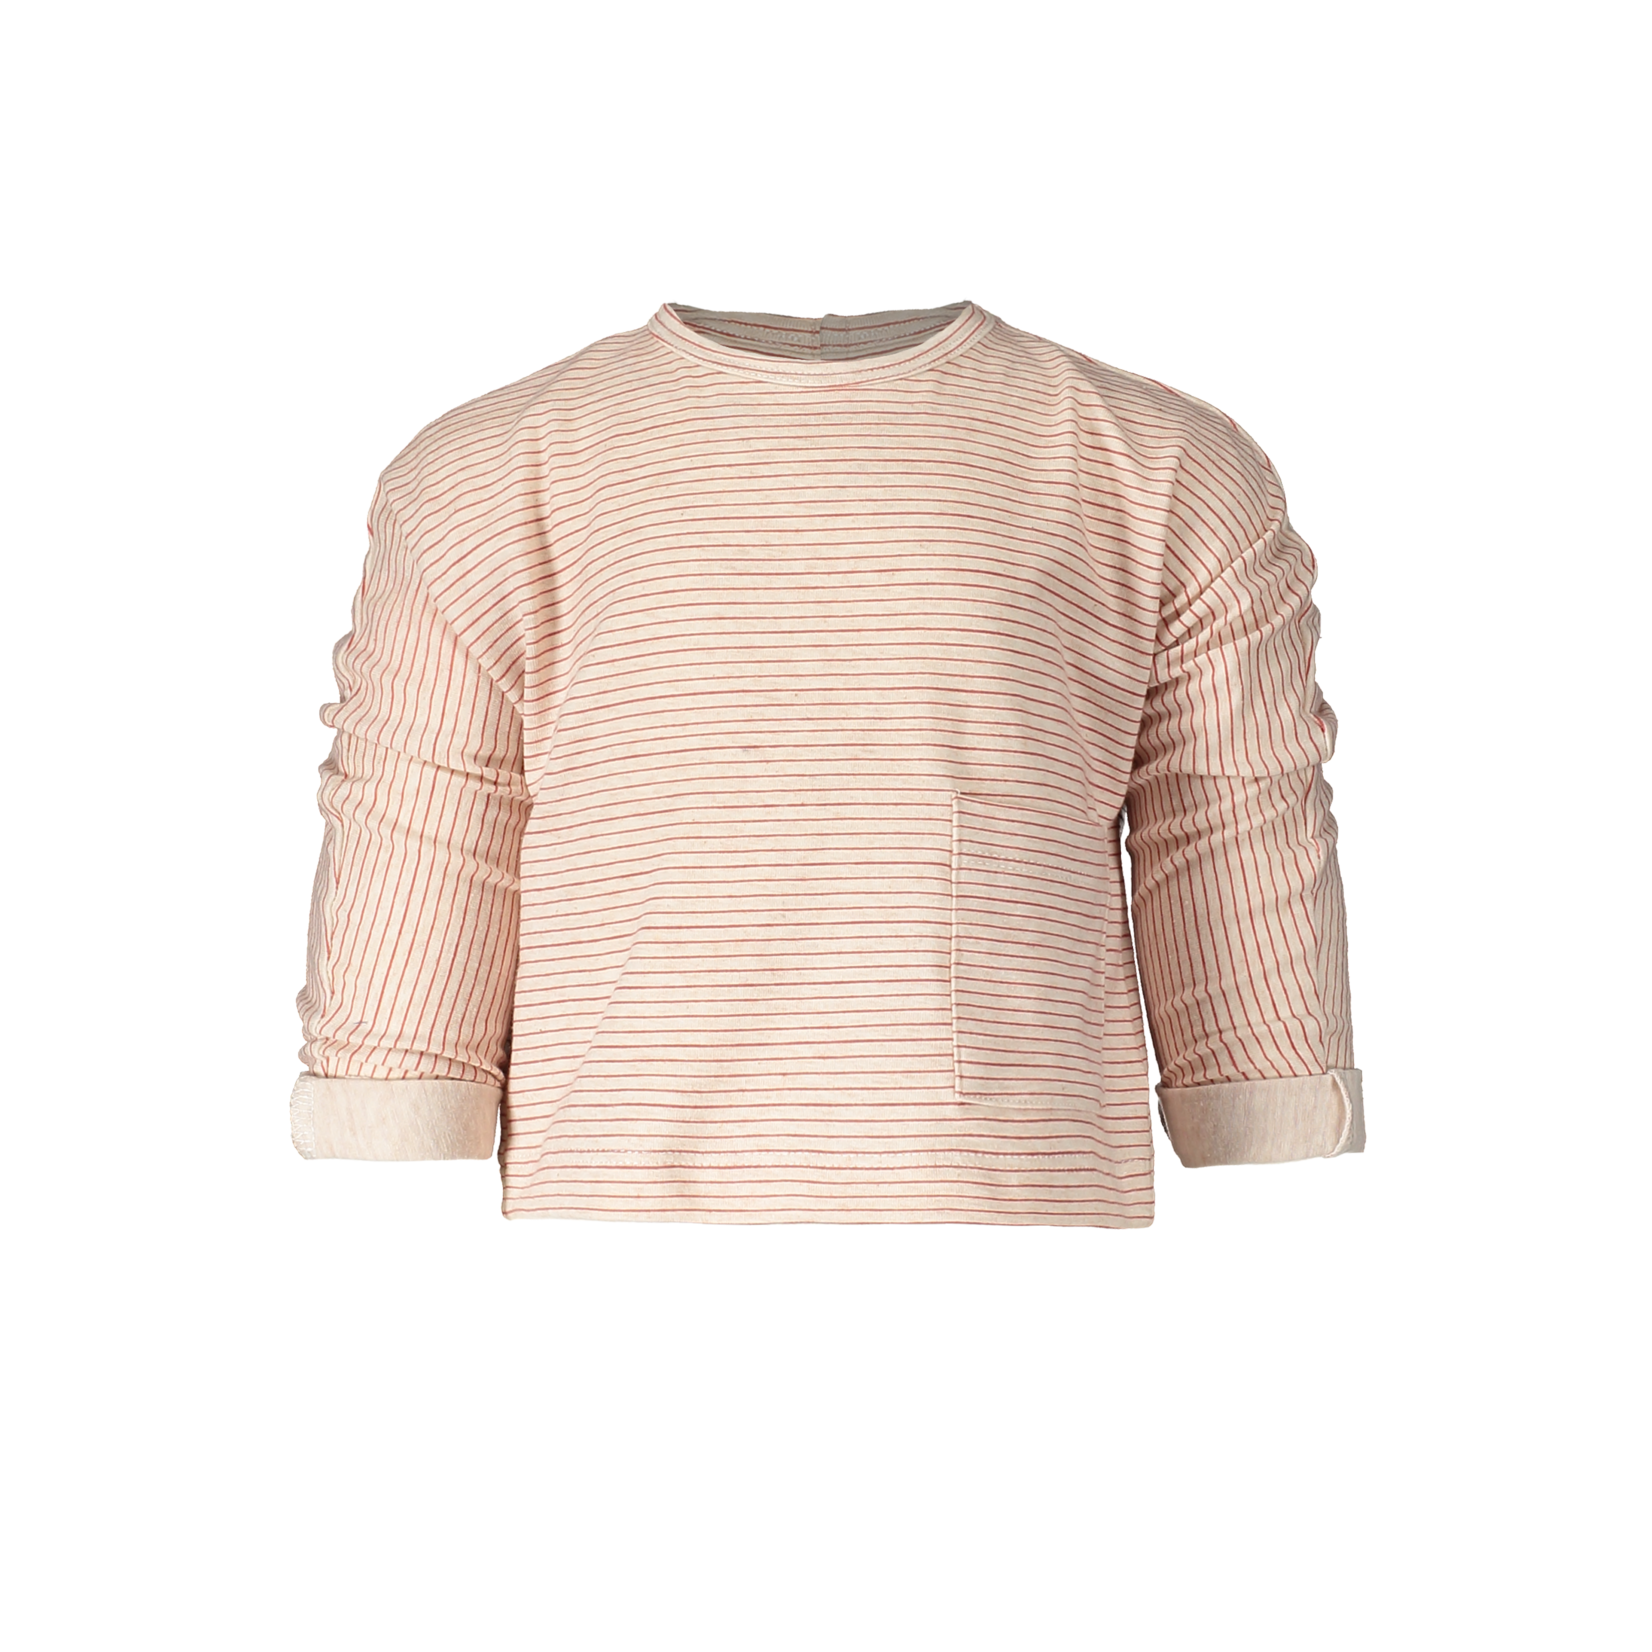 Pexi Lexi PL - Shirt LS Pocket - Stripe